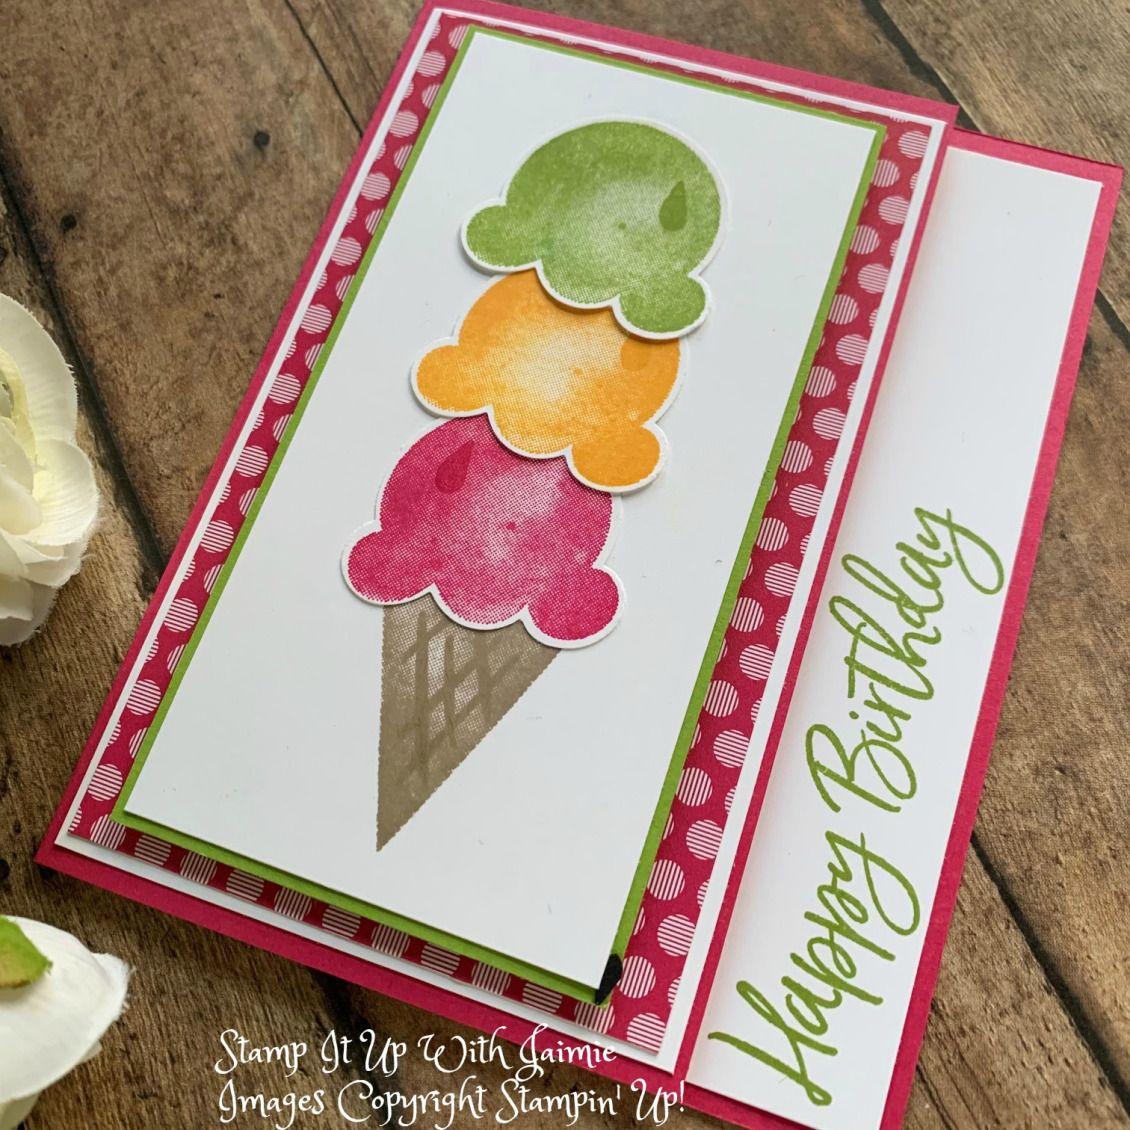 Stampin' Up! Sweet Ice Cream Card